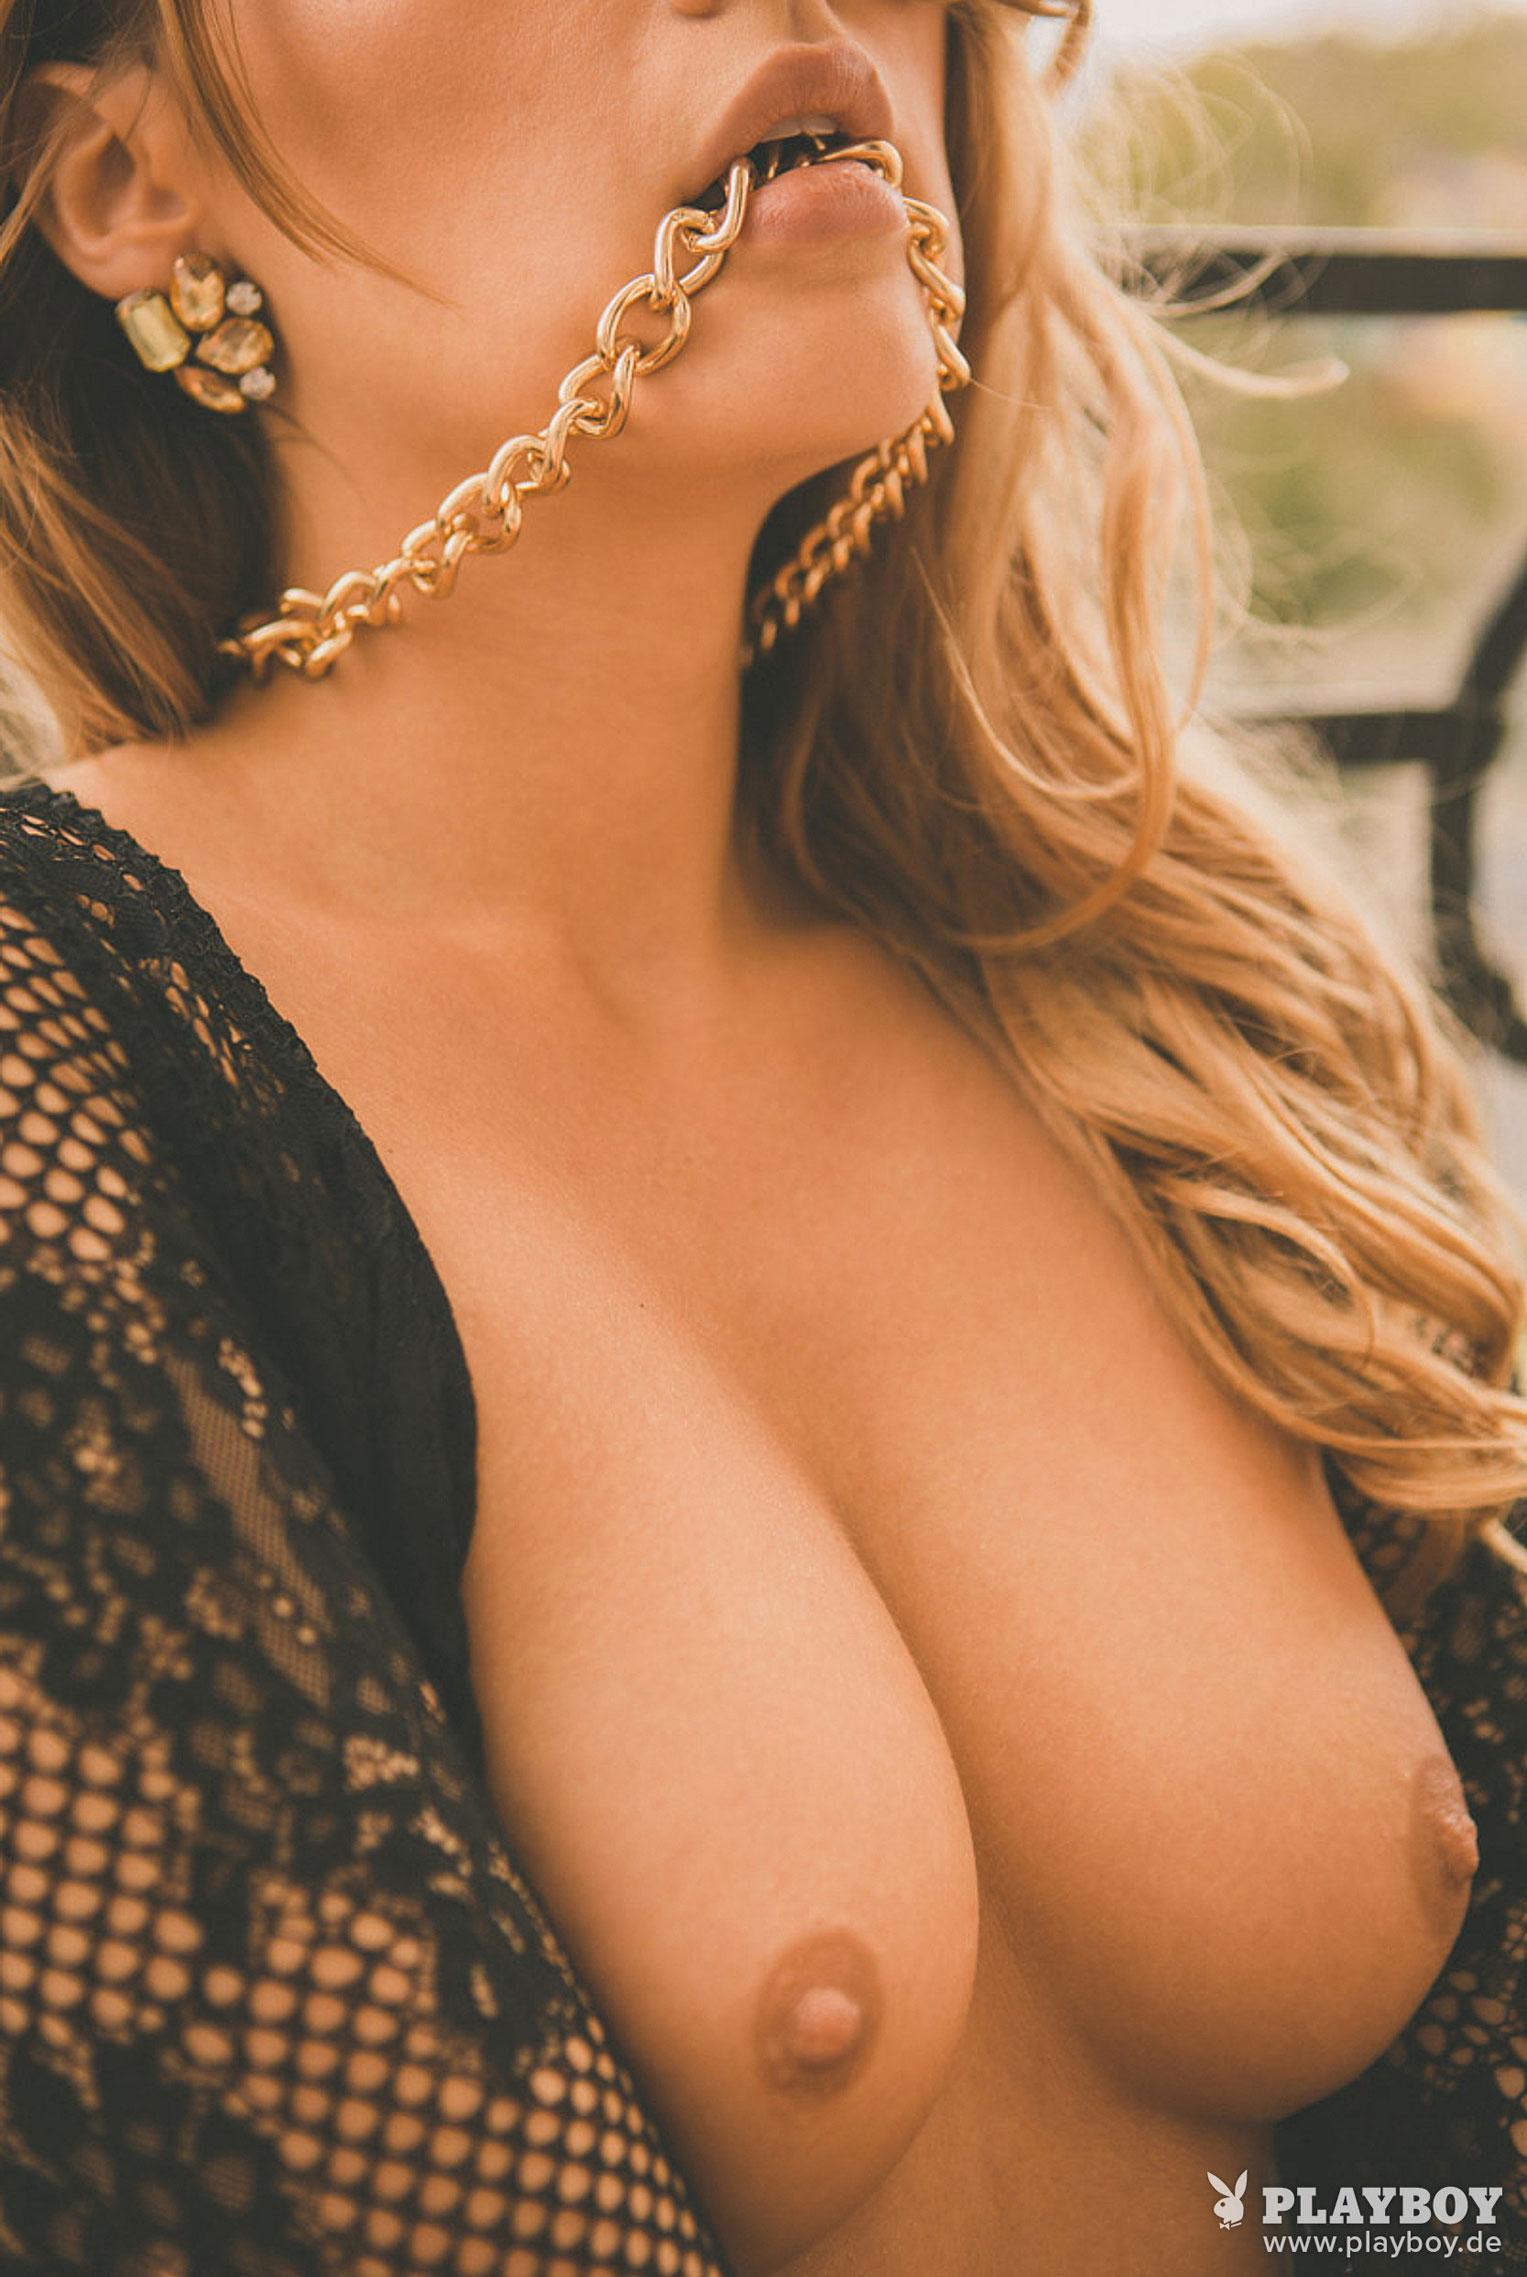 Девушка месяца Playboy Германия декабрь 2019 - Лена Беднарска / фото 11